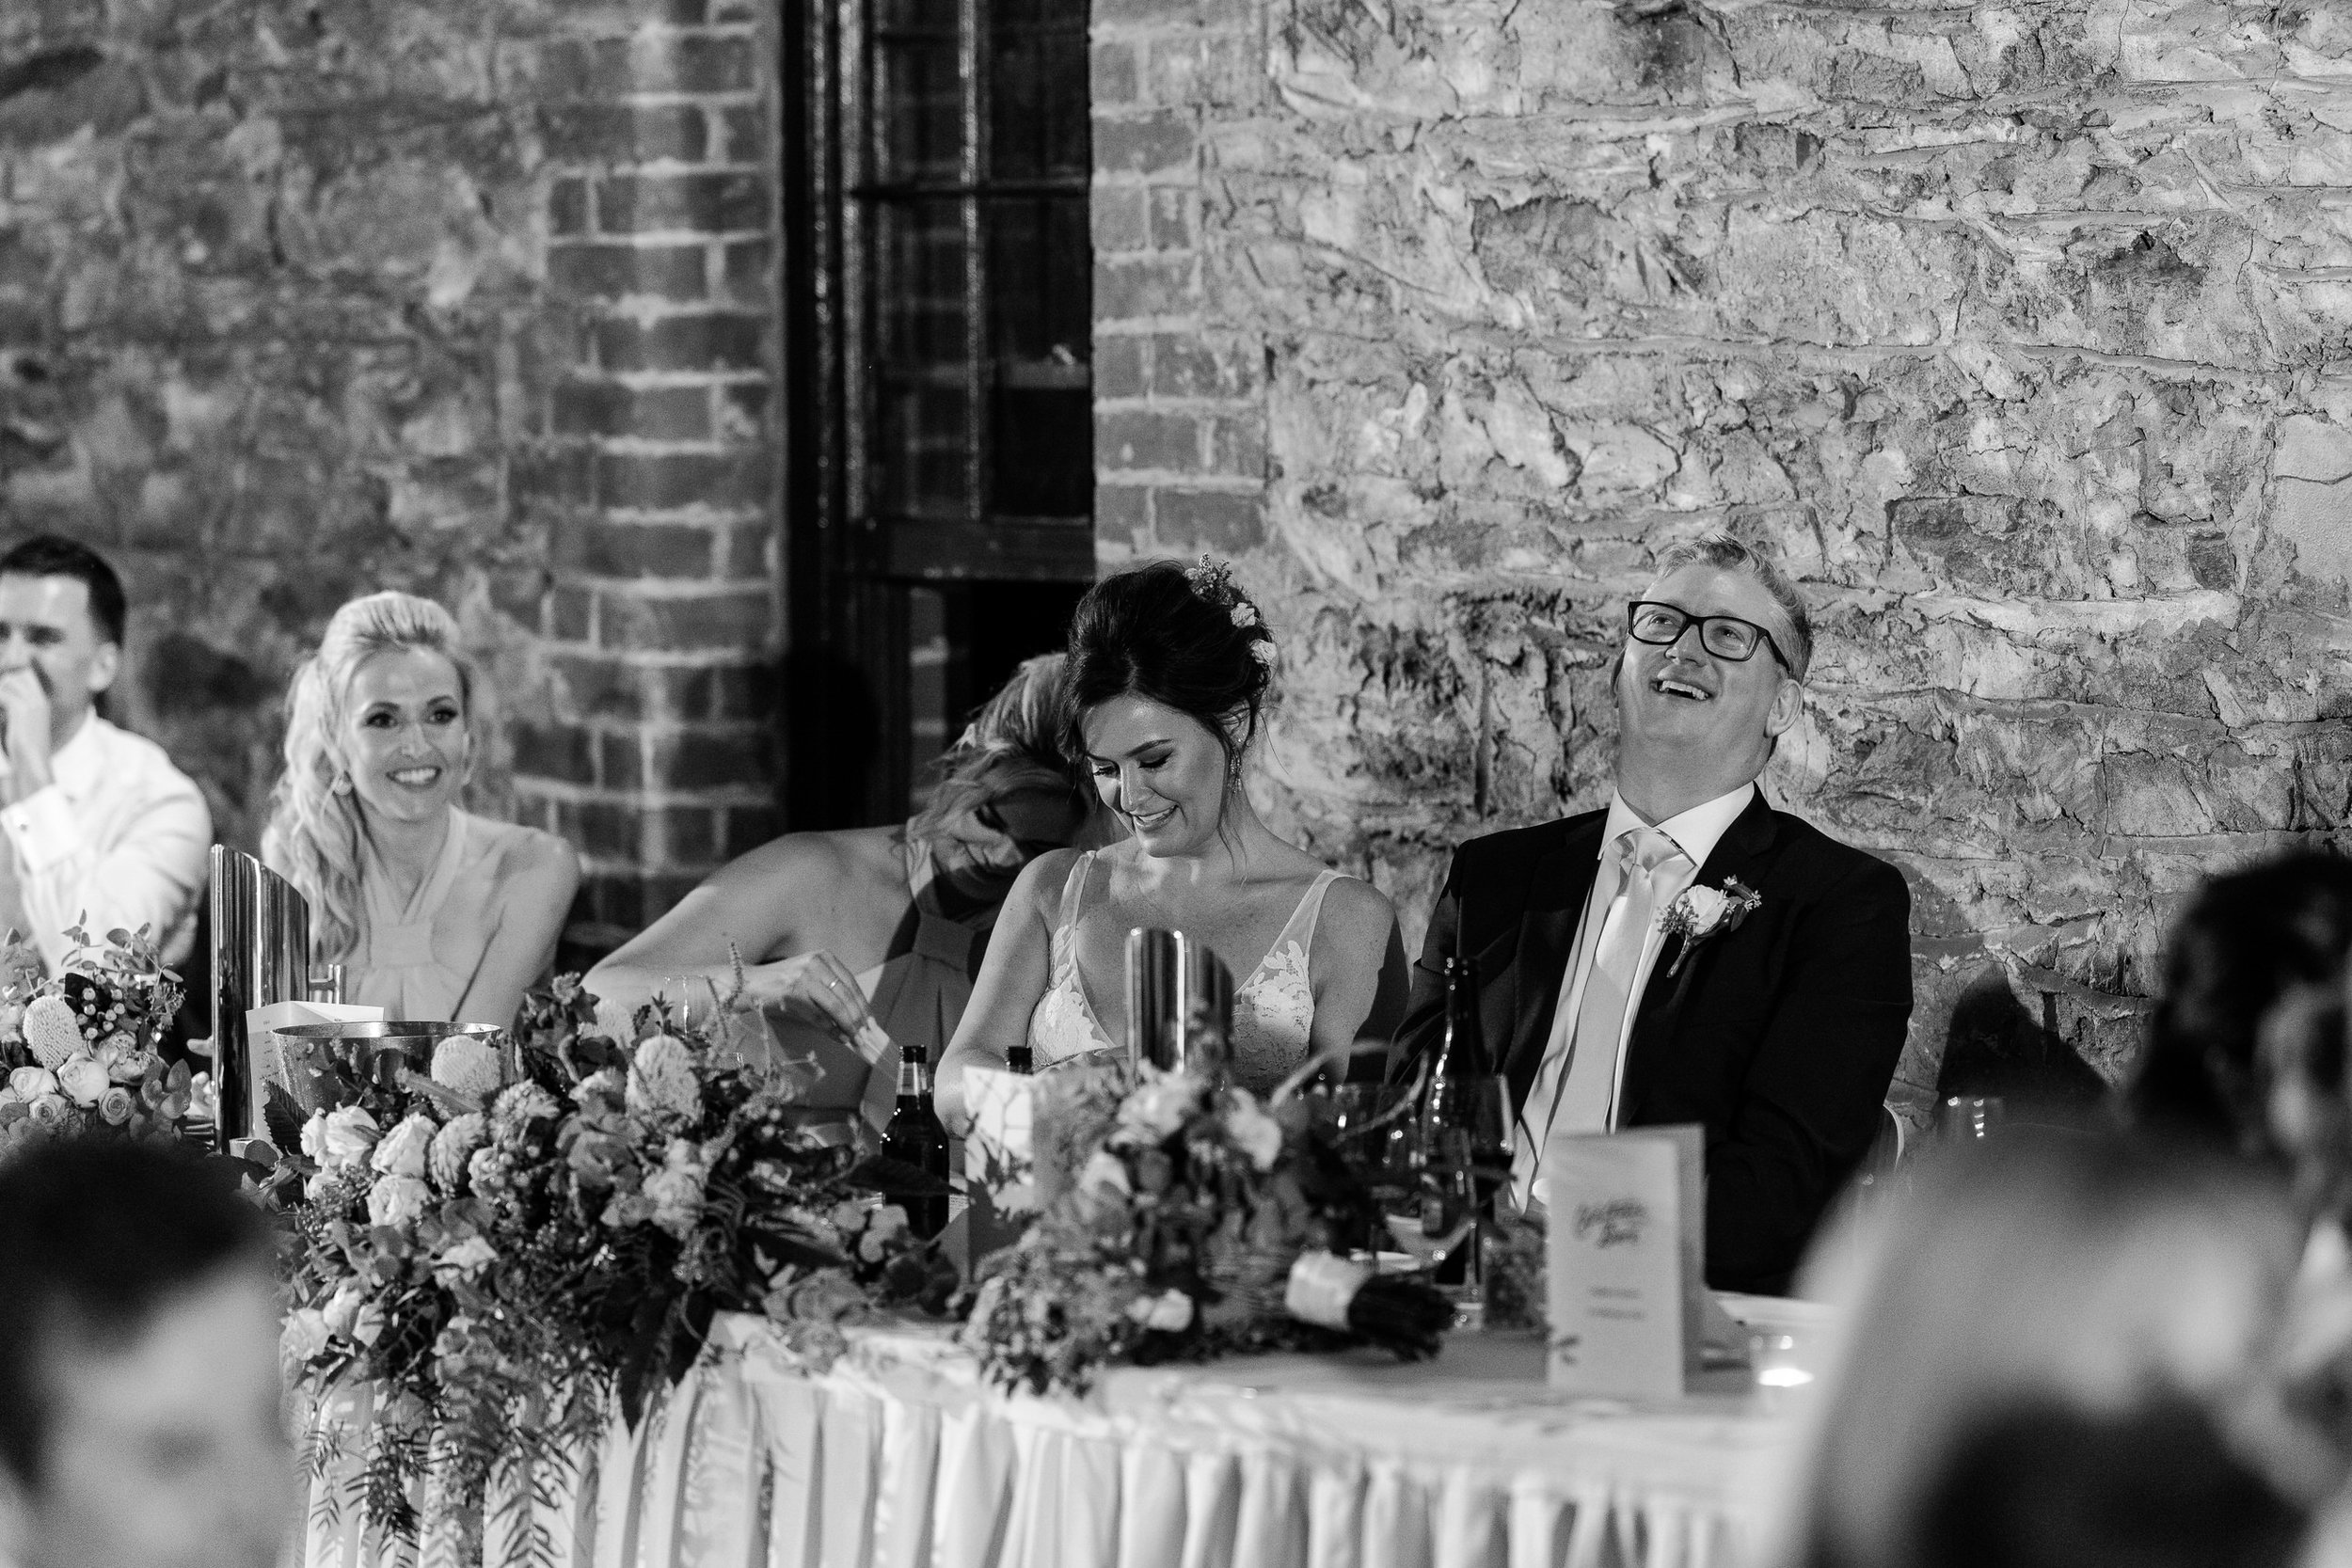 Justin_And_Jim_Photography_Chateau_Dore_Bendigo_Wedding86.JPG